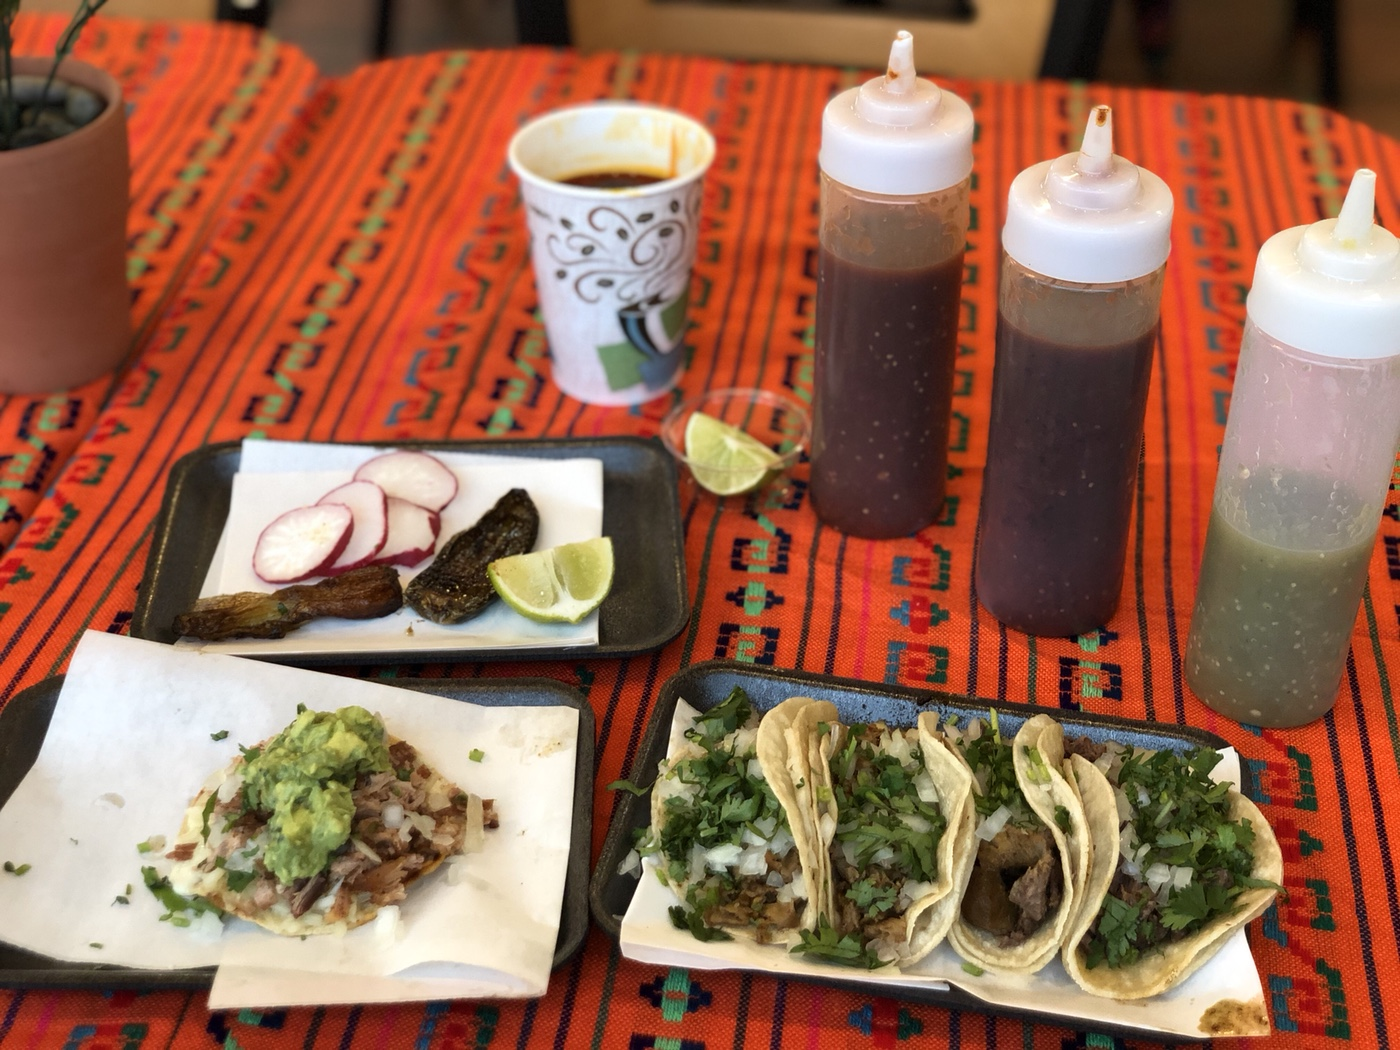 First Look At Taqueria La Chona A Must Try Mexican Restaurant Wichita By E B Cumbias viejitas pero bonitas para bailar cumbias para bailar cumbias para bailar toda la noche. first look at taqueria la chona a must